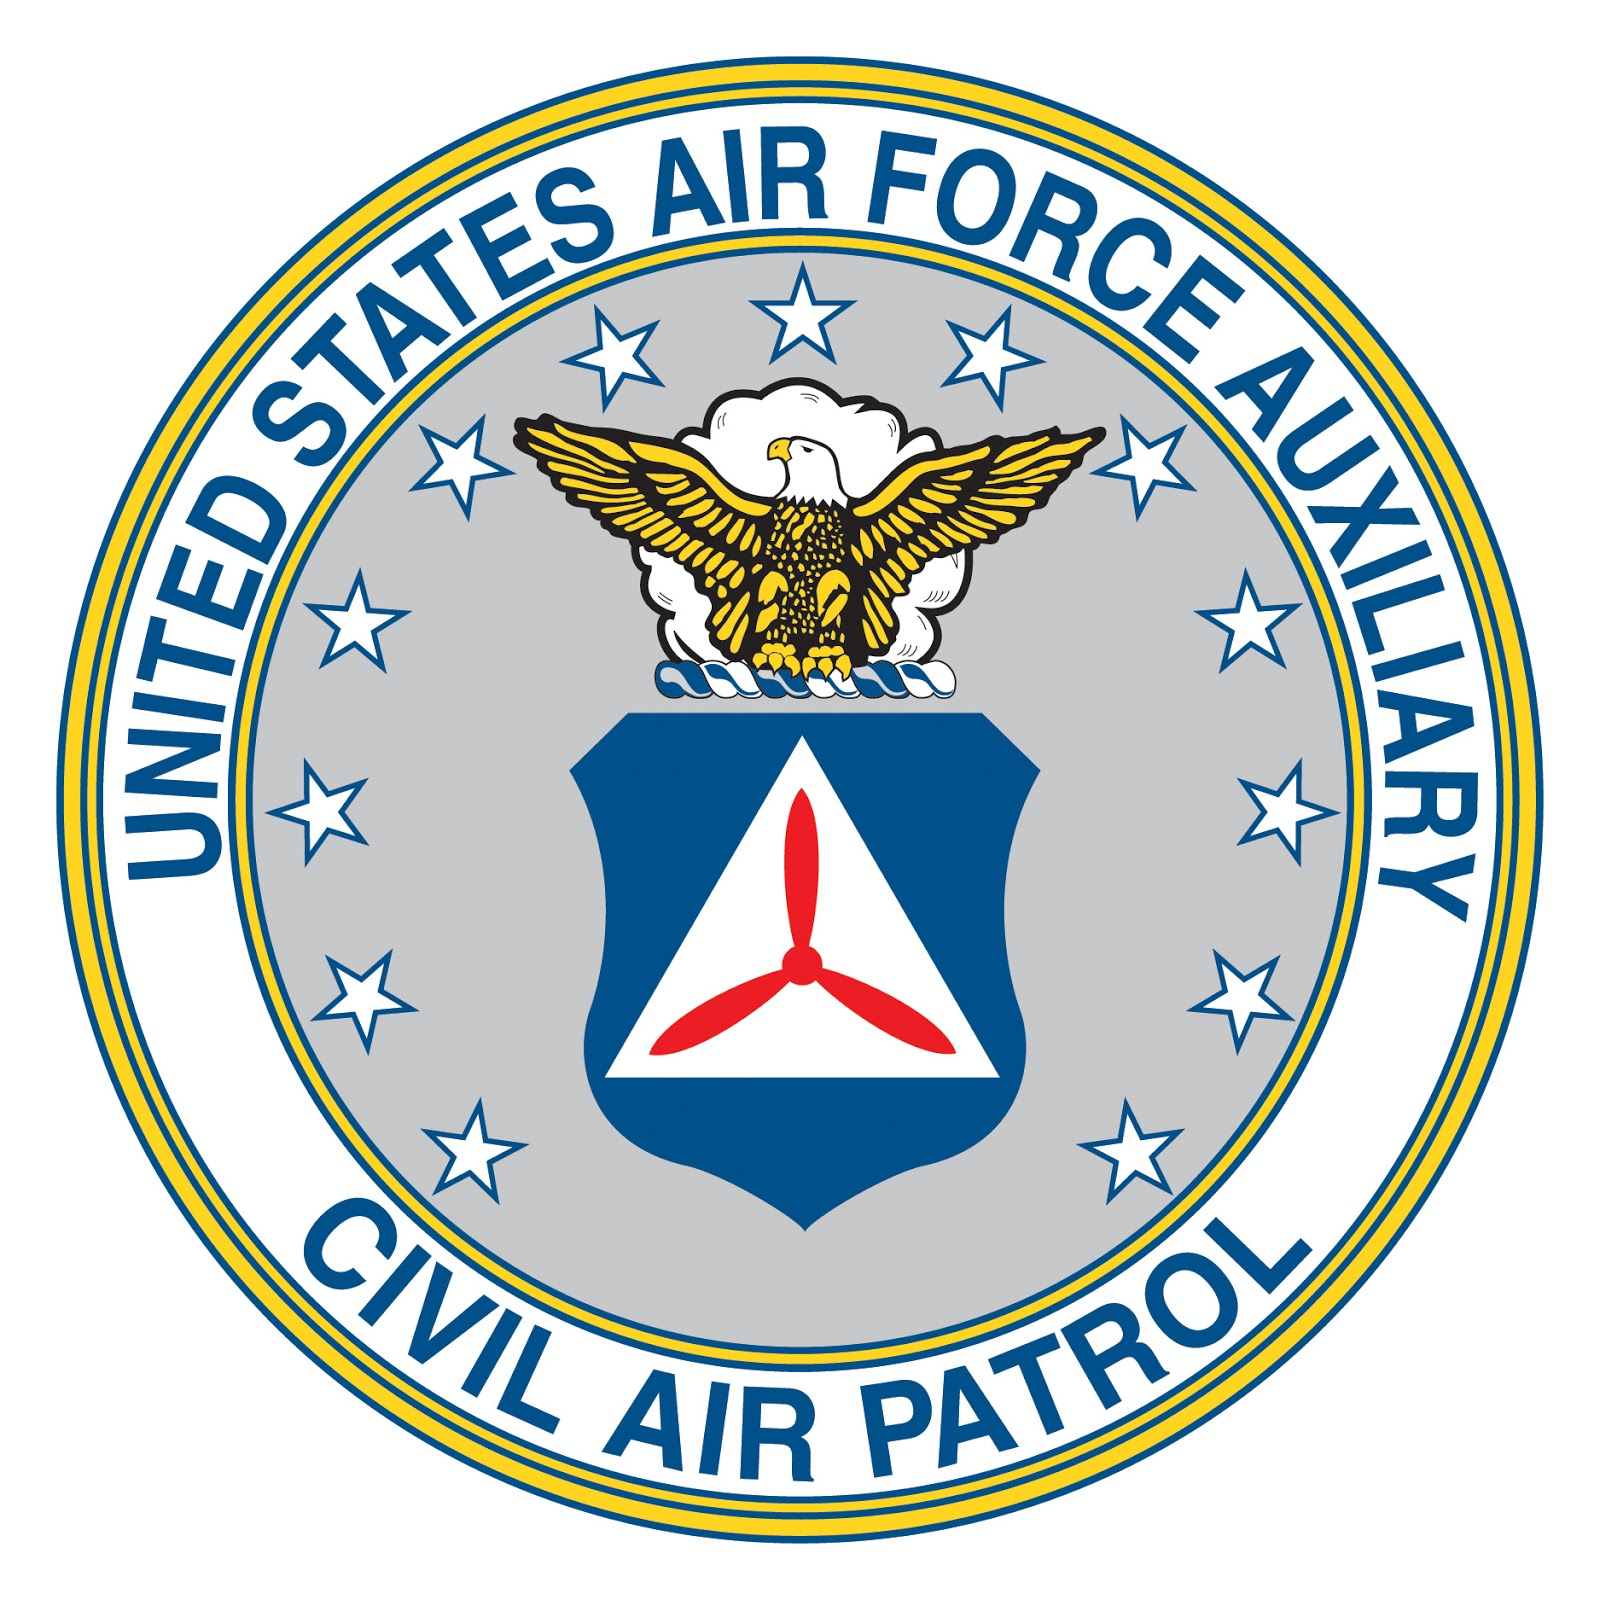 Long Beach Senior Squadron 150 The Symbols Of Civil Air Patrol Part